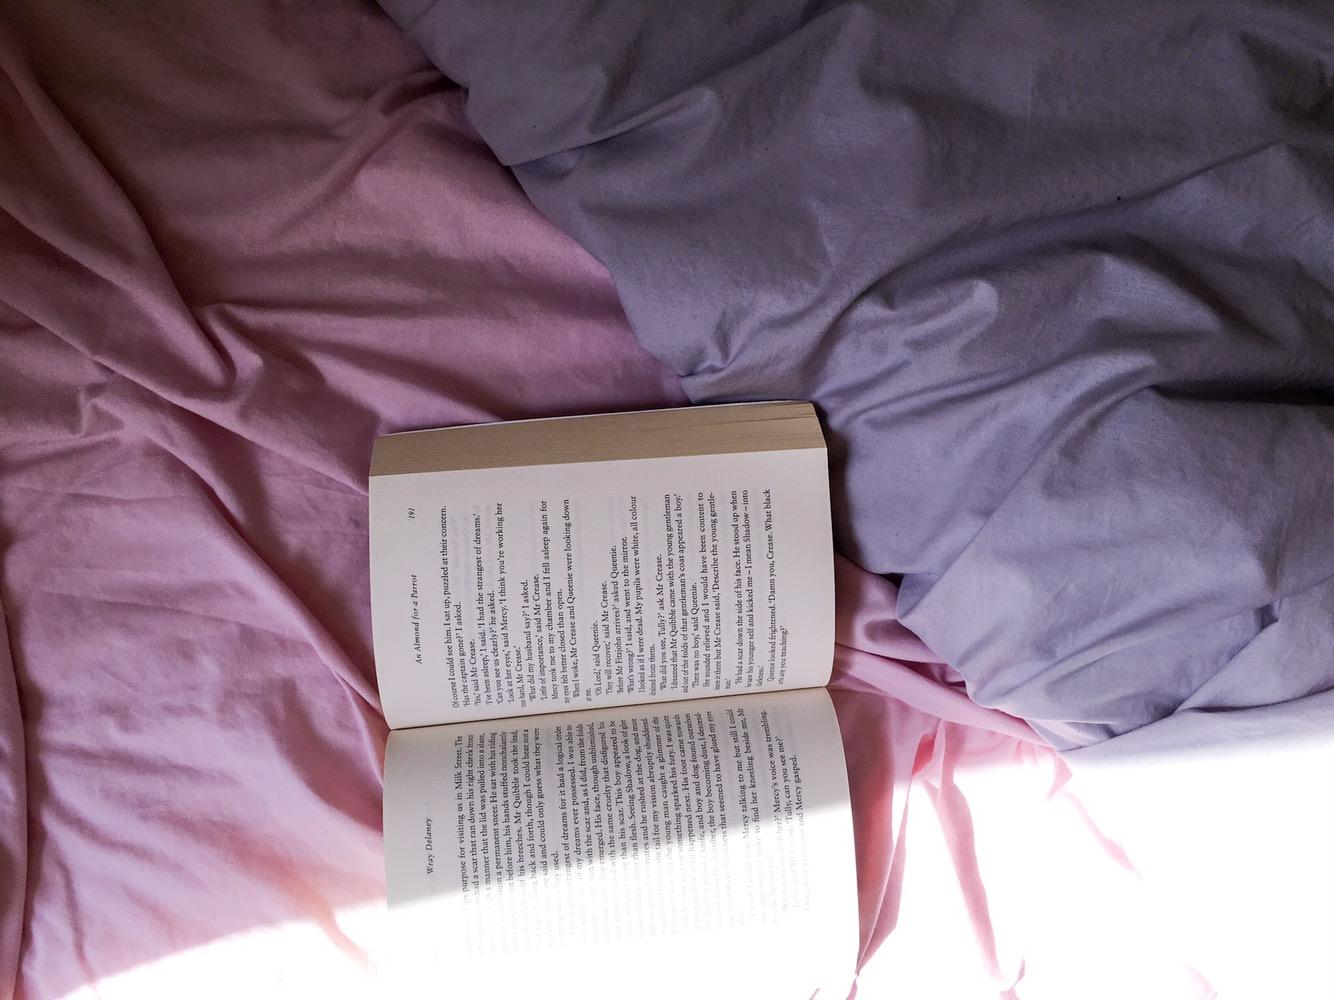 Reading a novel